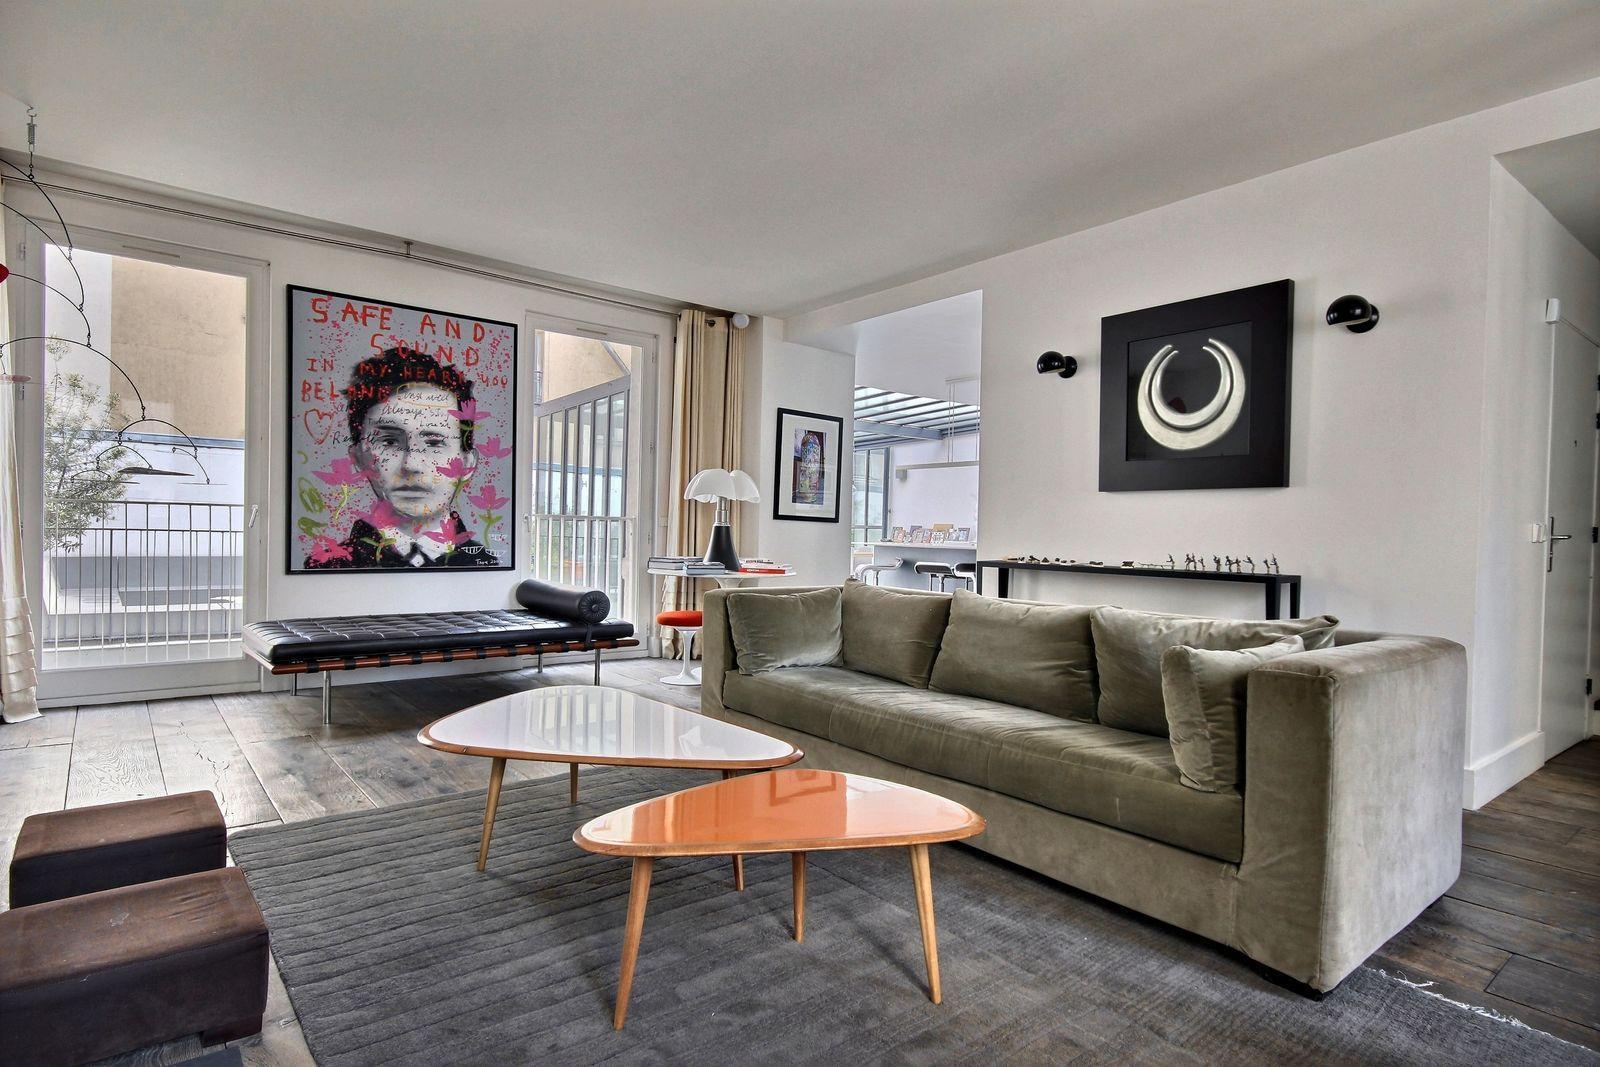 502254 - Spacious duplex apartment for 12 people near Les Halles